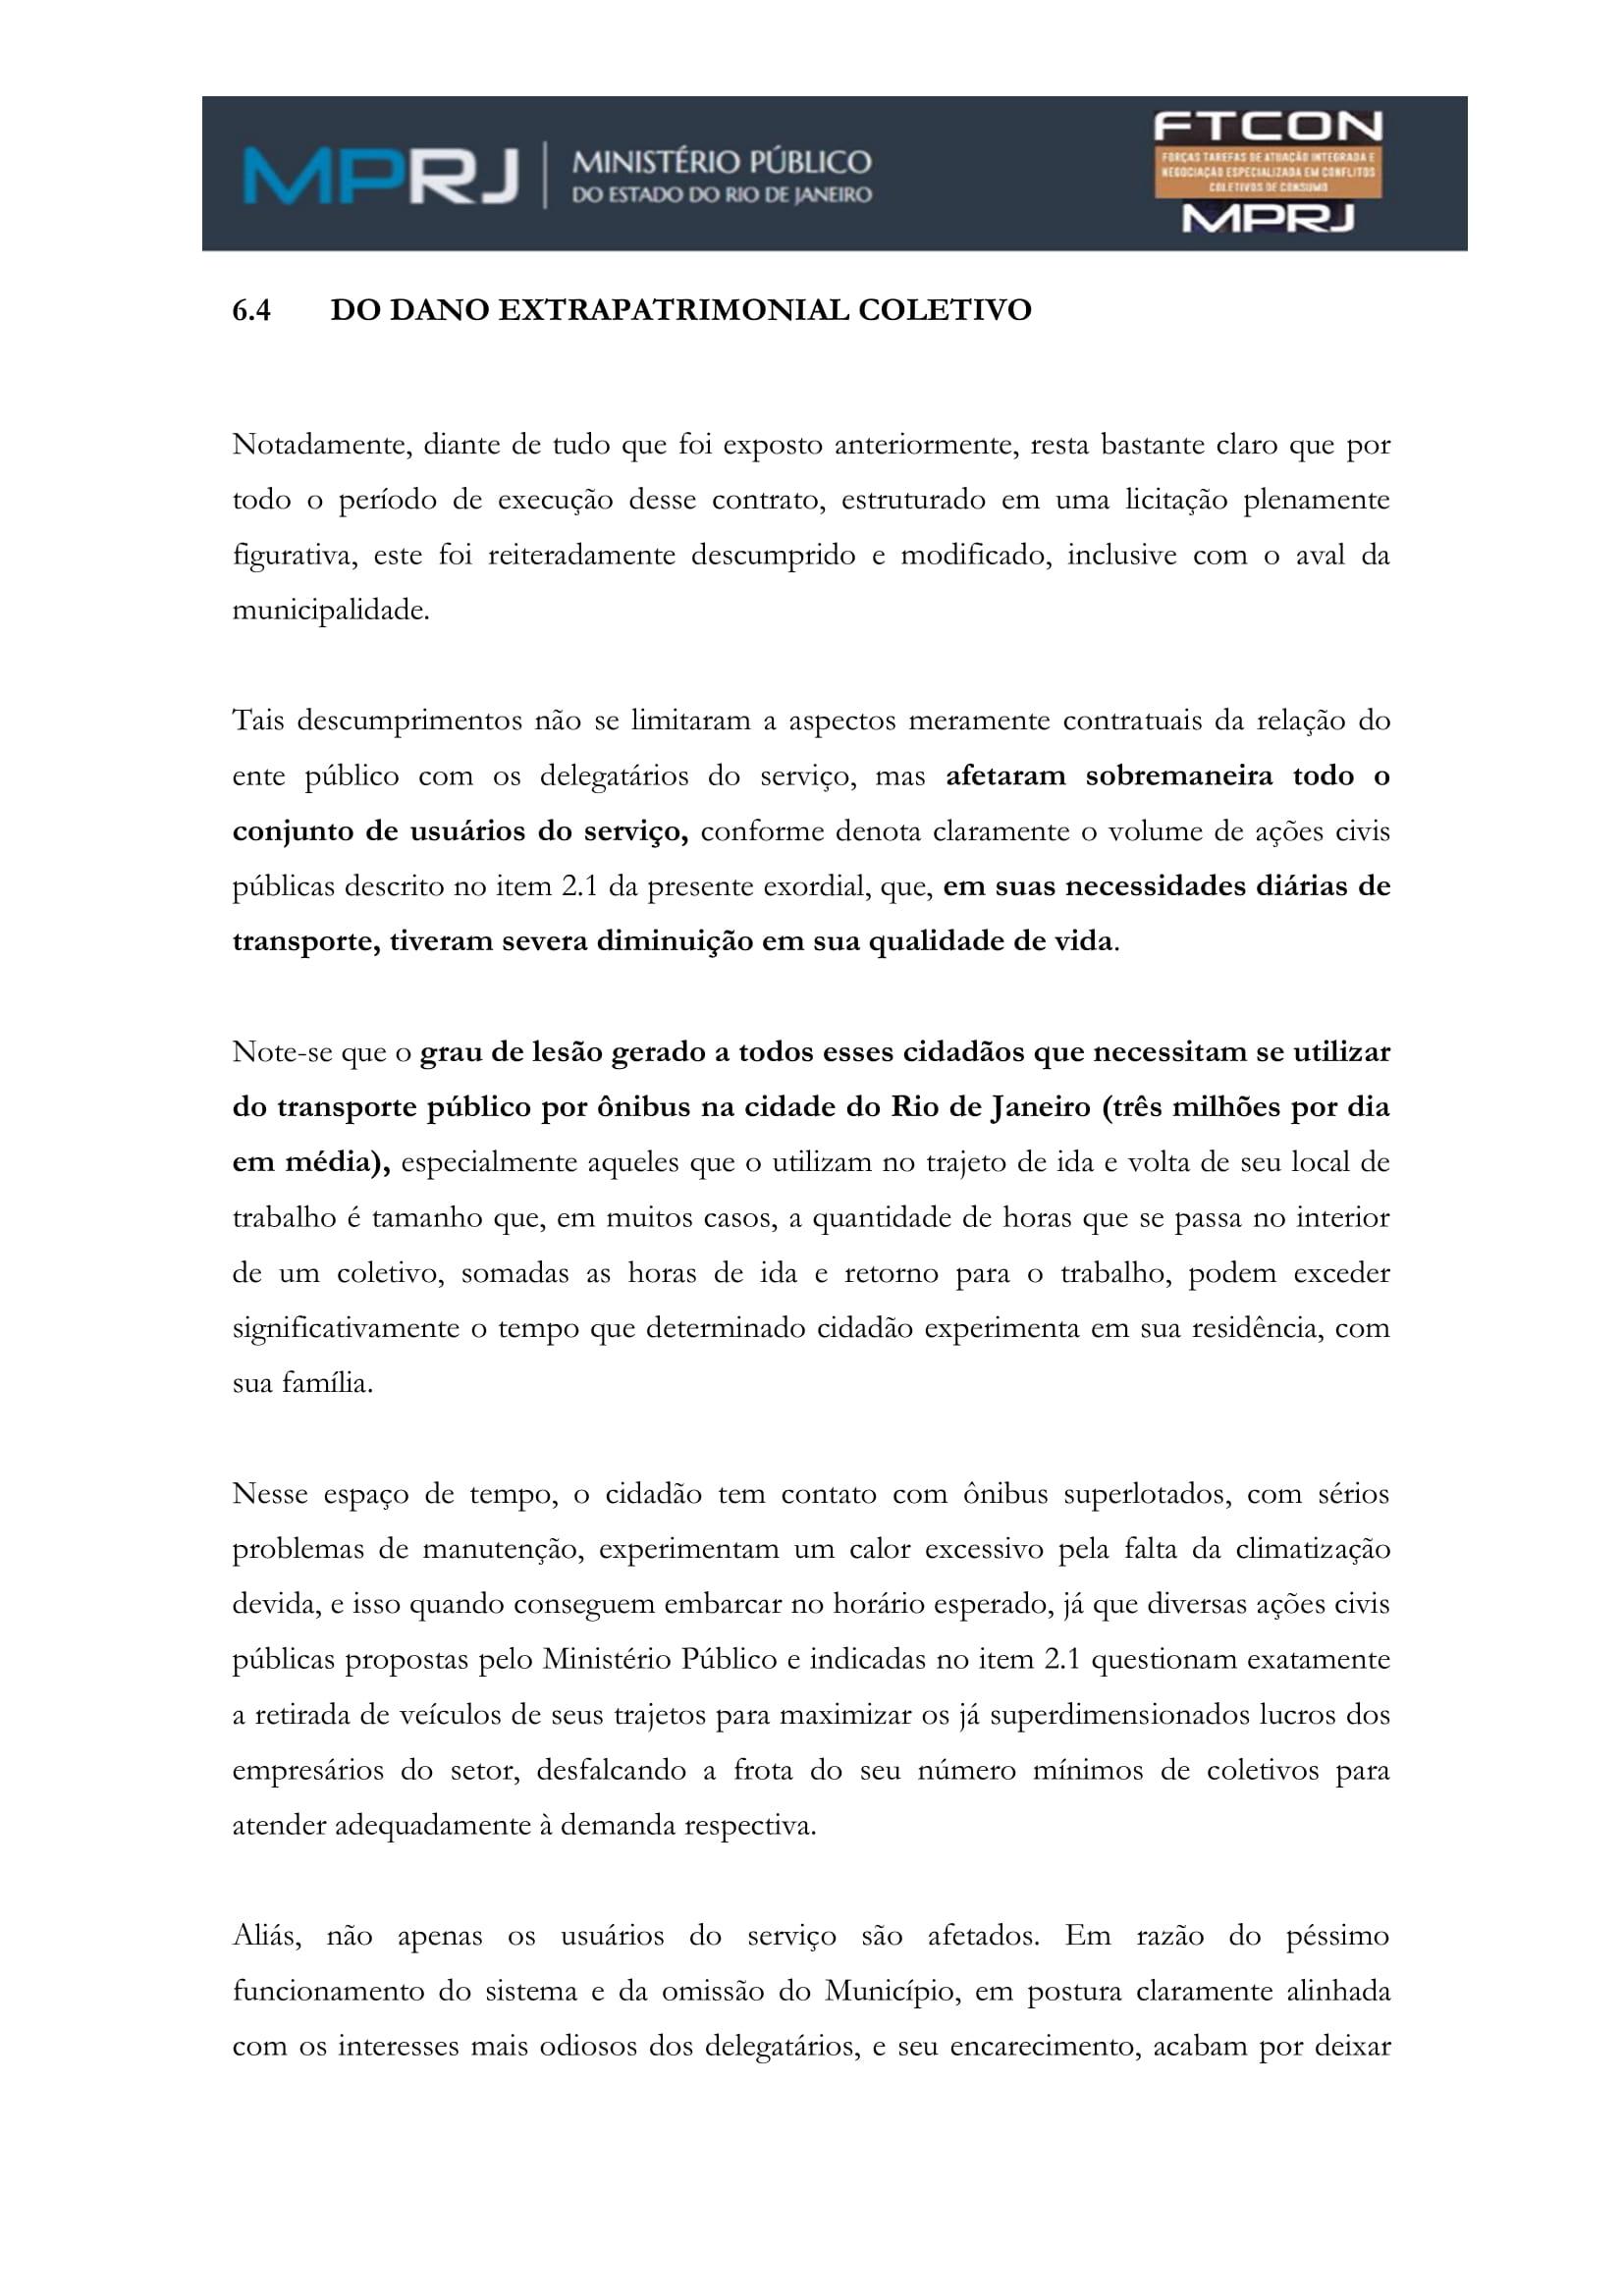 acp_caducidade_onibus_dr_rt-128